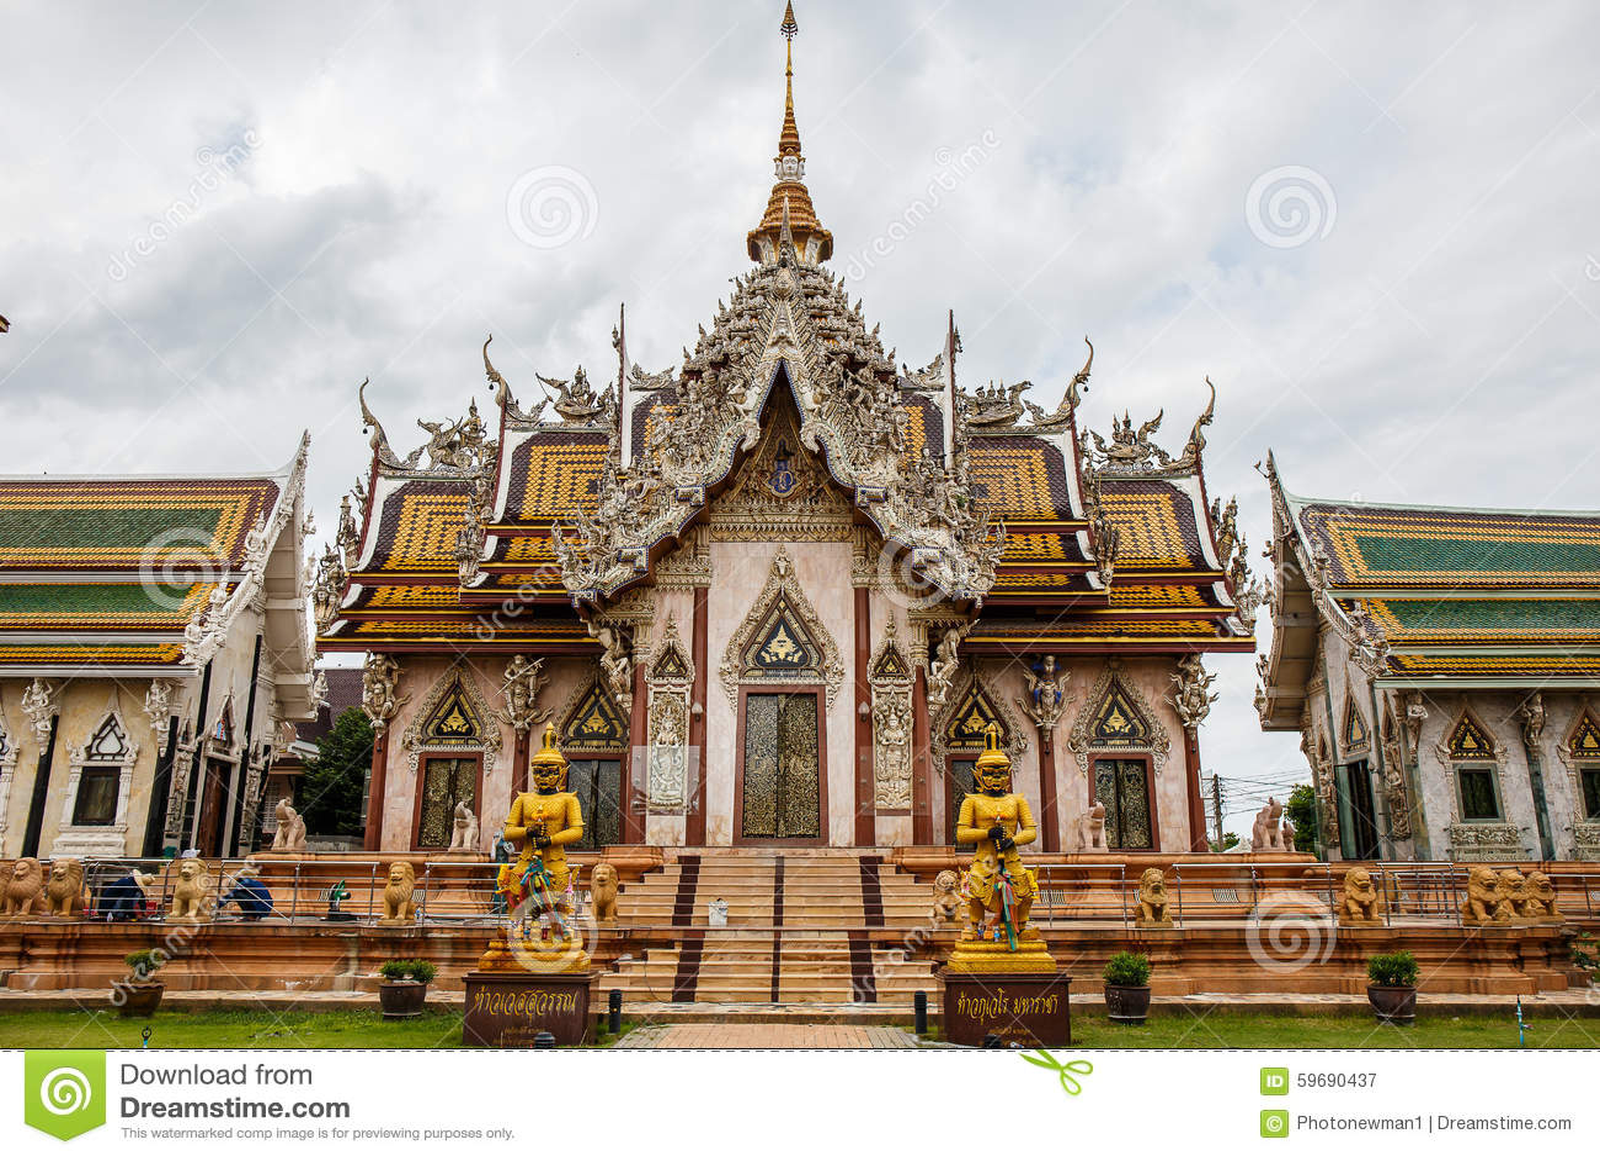 Wat Phra Rahu Temple Nakhon Pathom Stock Photo